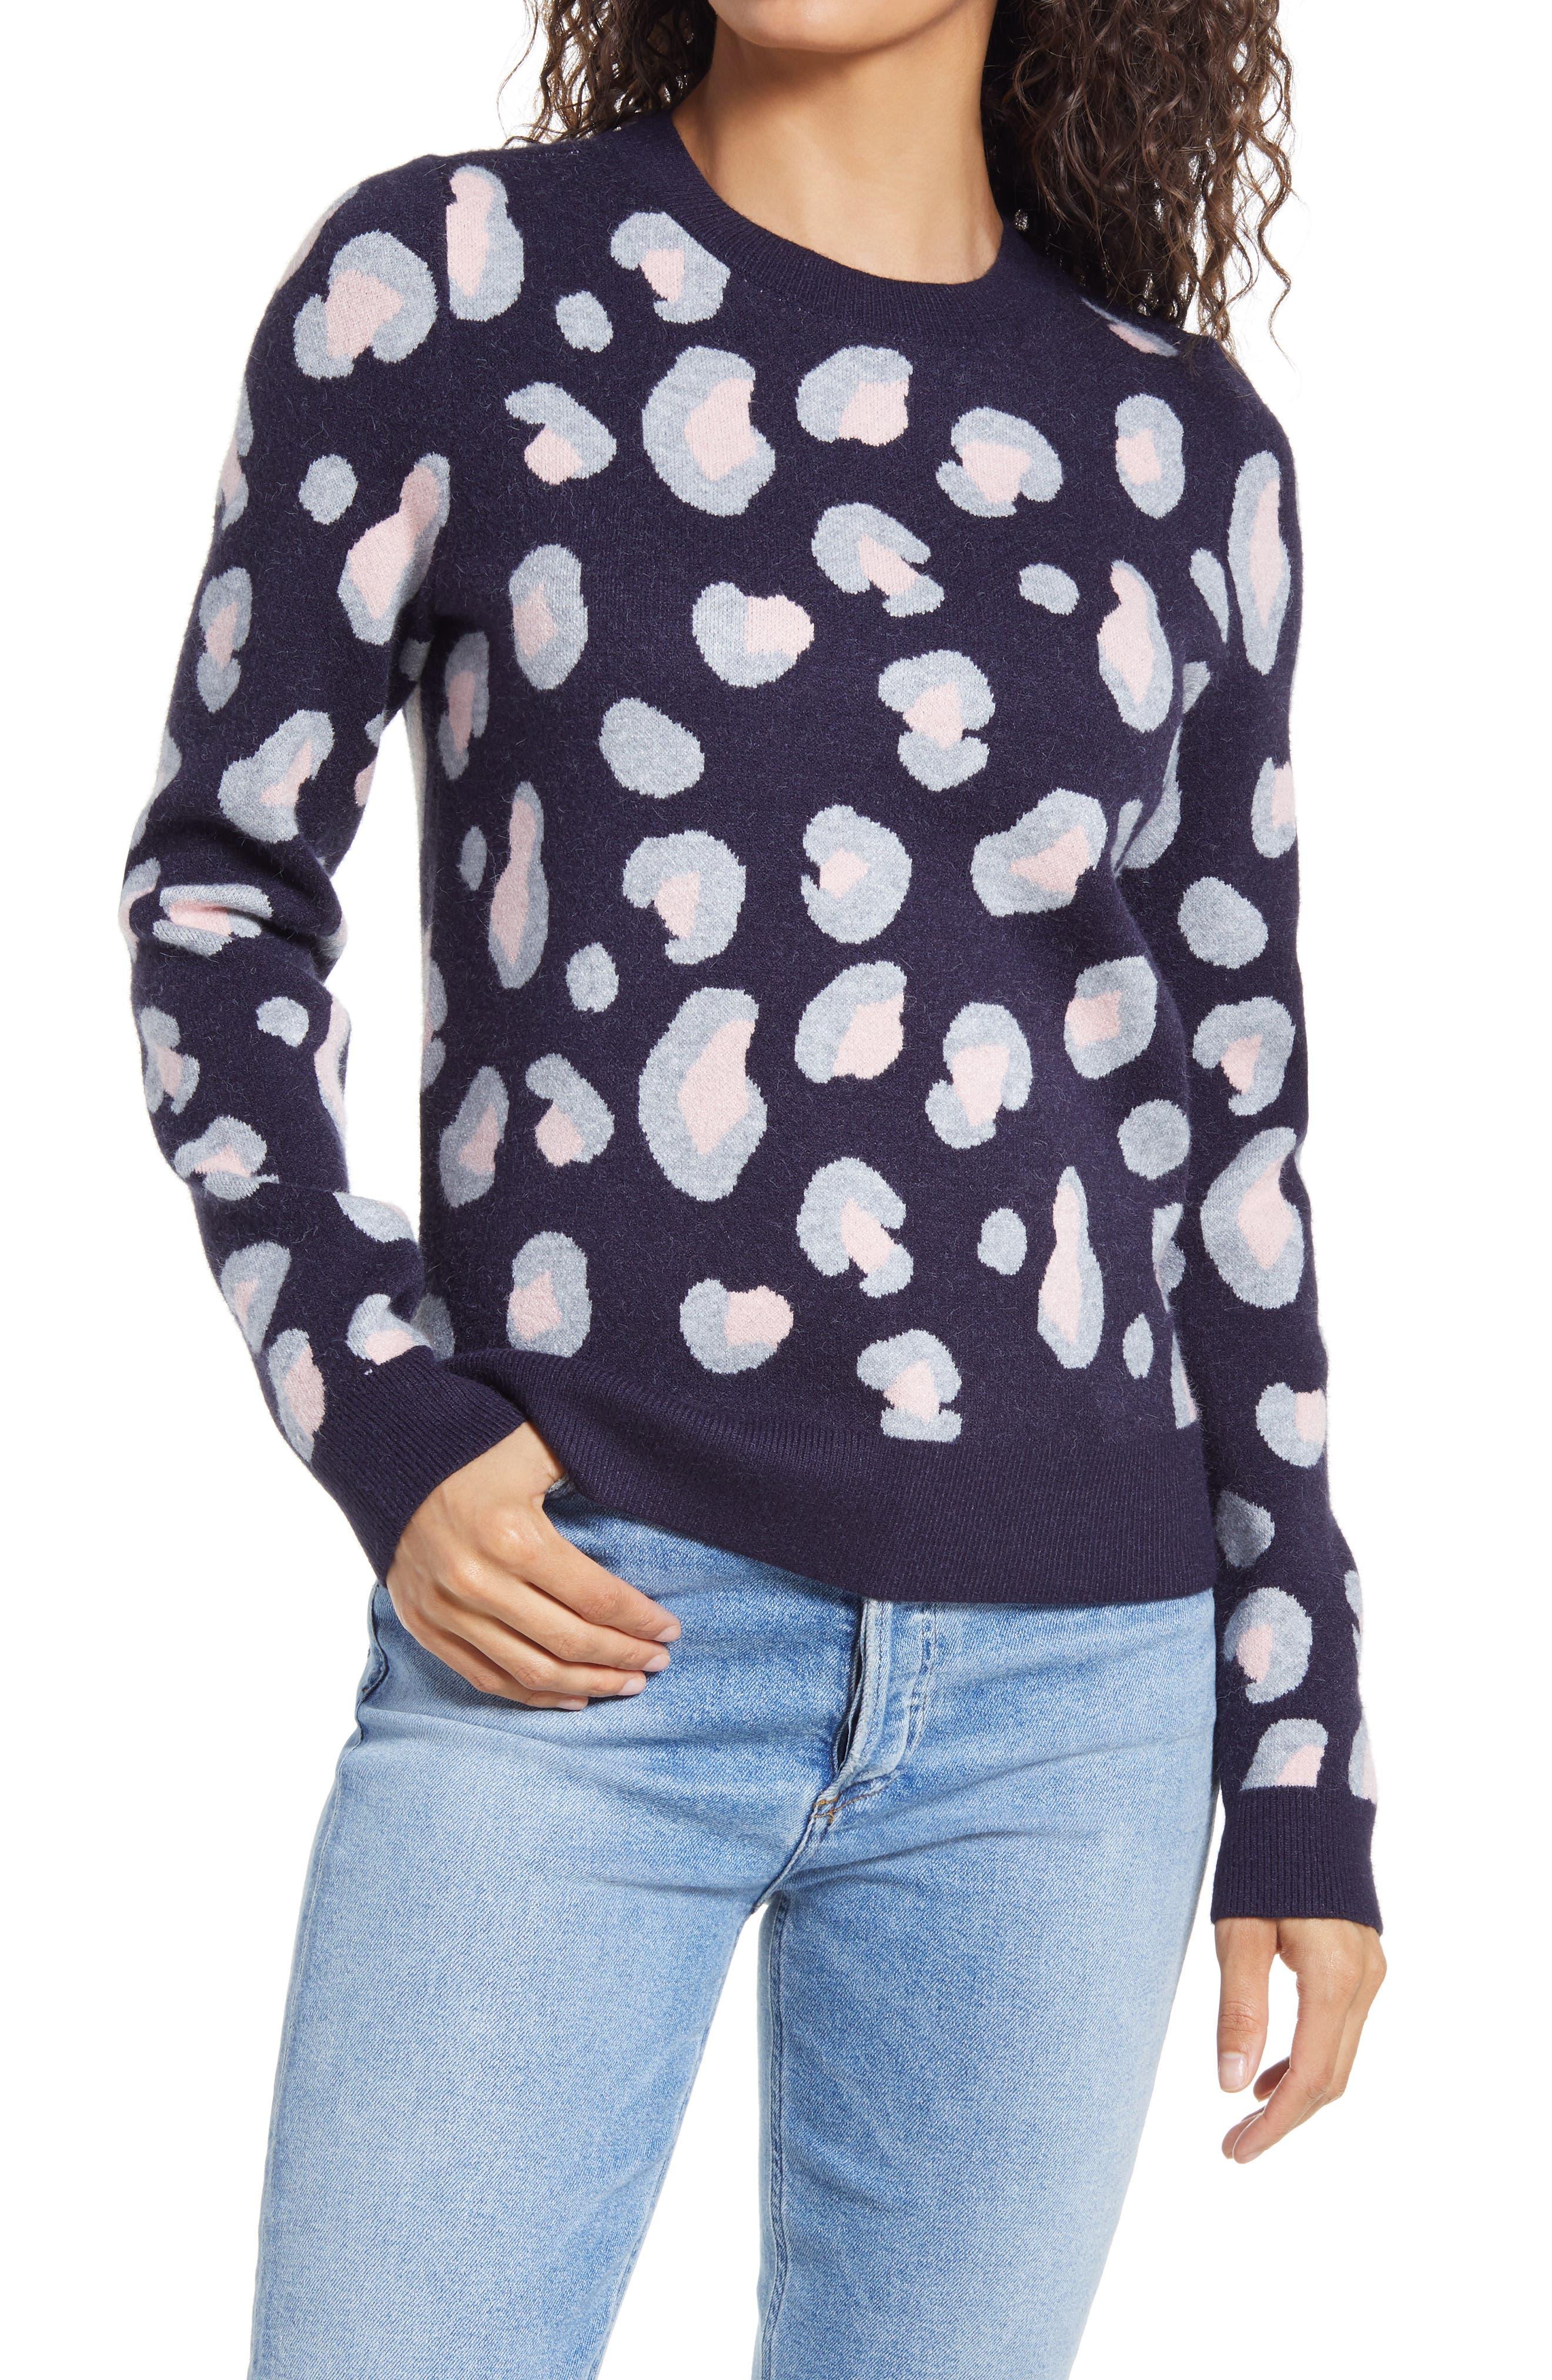 1901 Cheetah Pattern Crewneck Sweater   Nordstrom